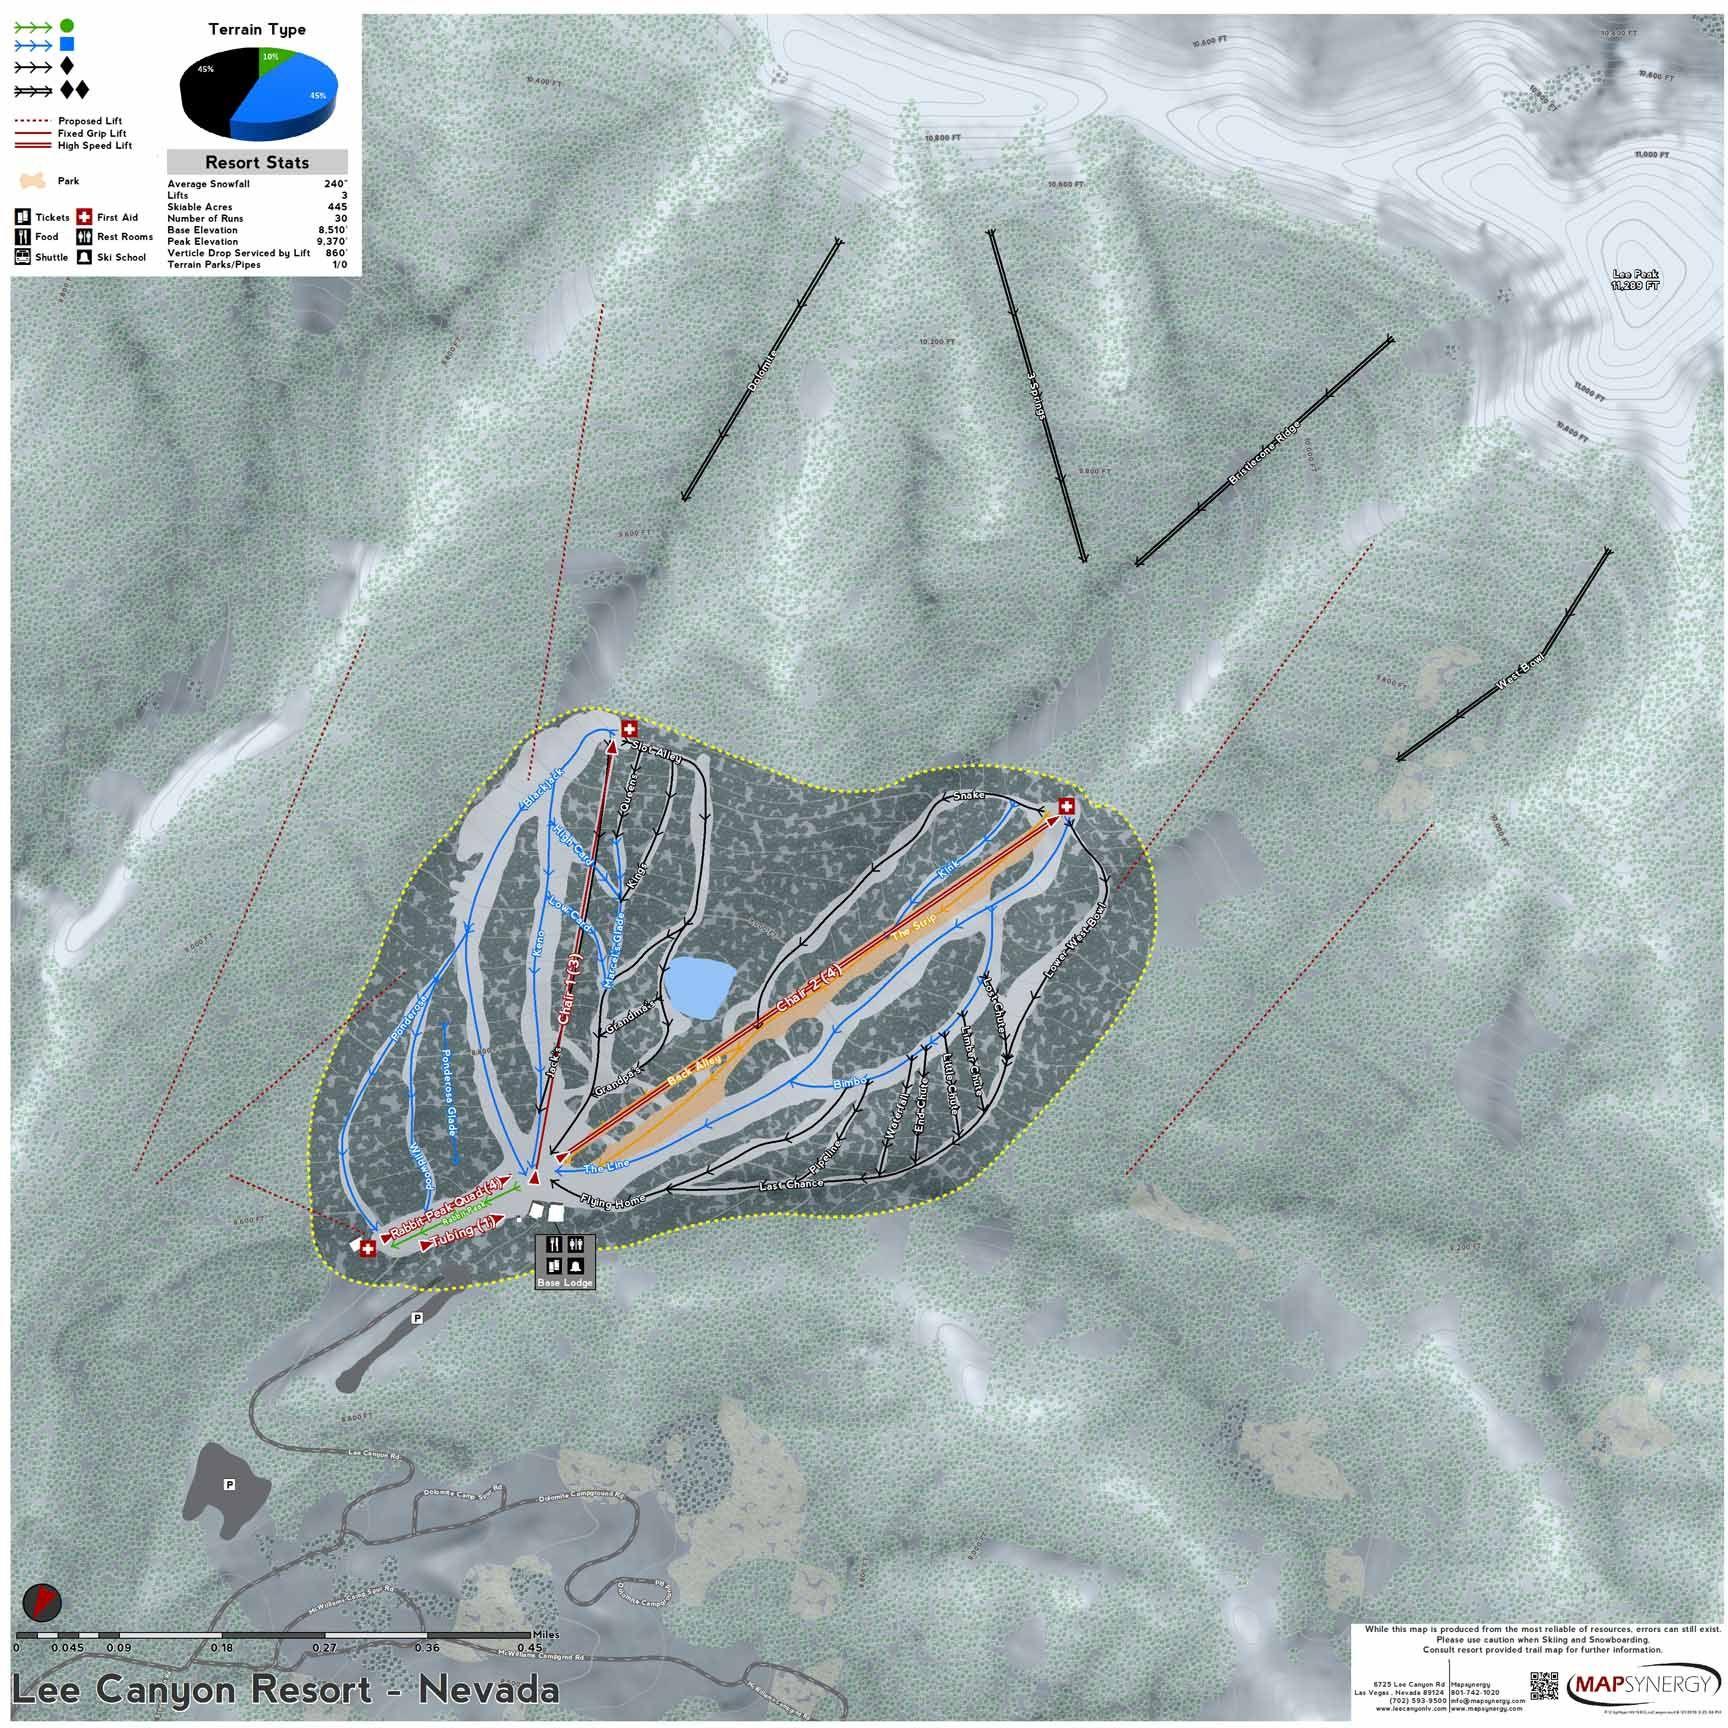 Worksheet. Lee Canyon Resort ski map  Nevada Ski Resort Maps  Pinterest